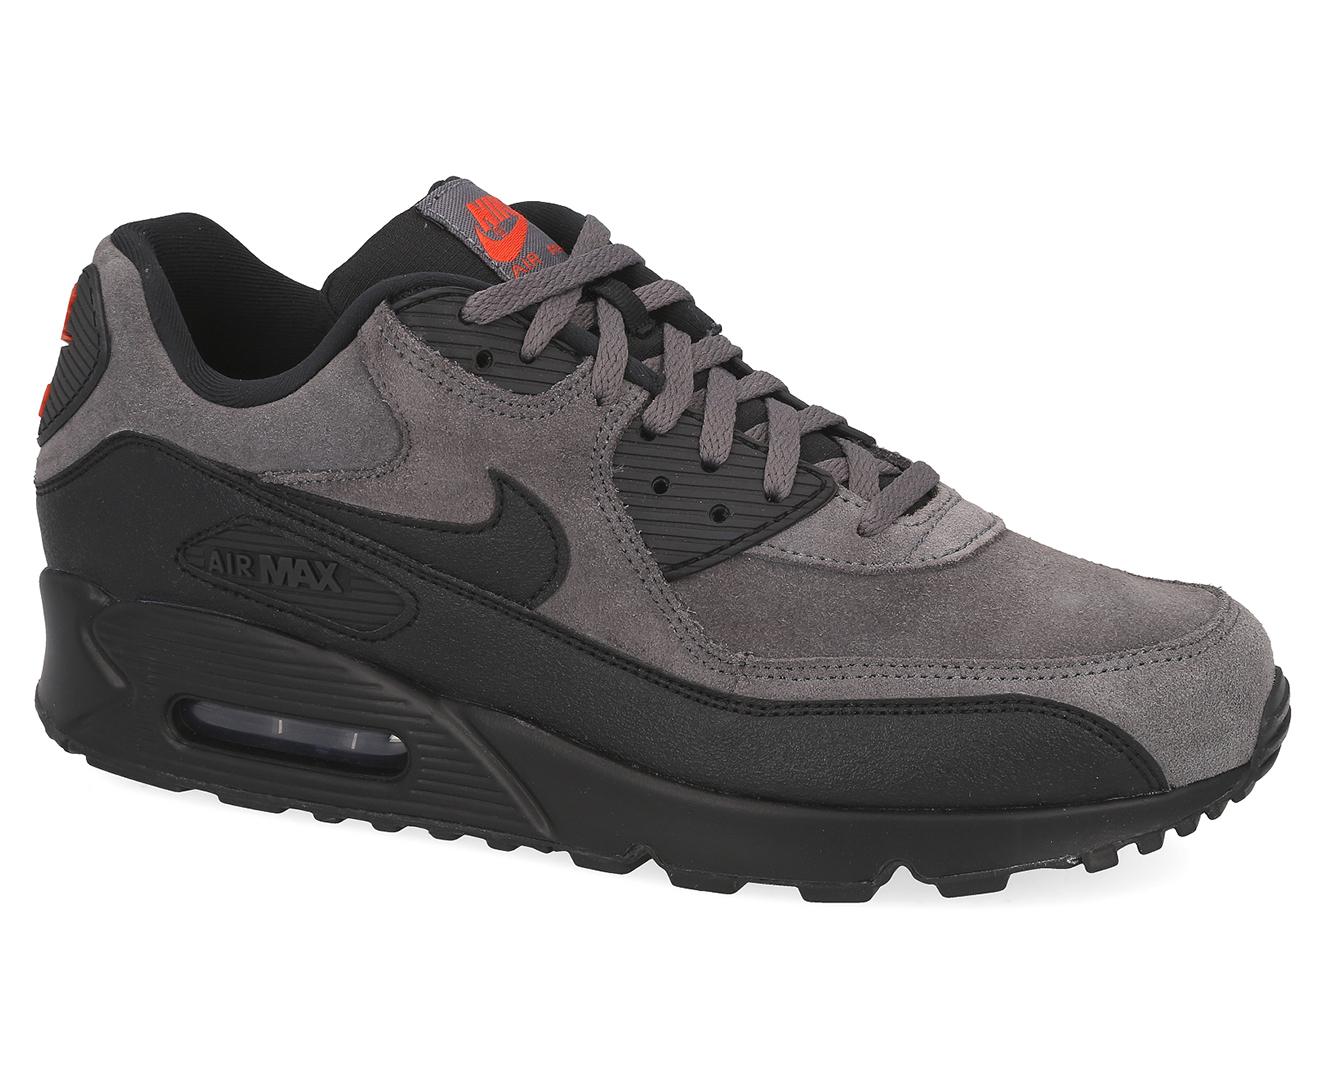 Nike Men's Air Max 90 Essential Sneakers Dark GreyBlack